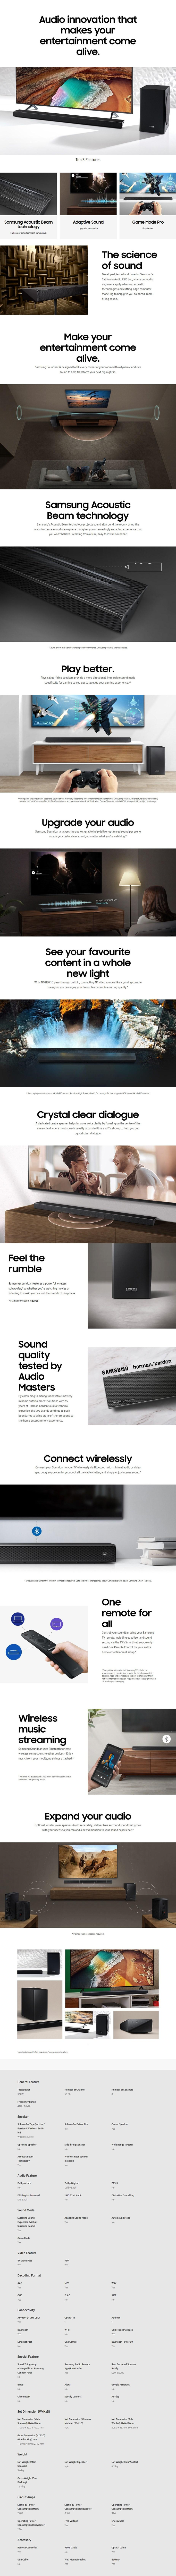 Samsung Series 6 HW-Q60R 5.1 Panoramic Soundbar - Desktop Overview 1